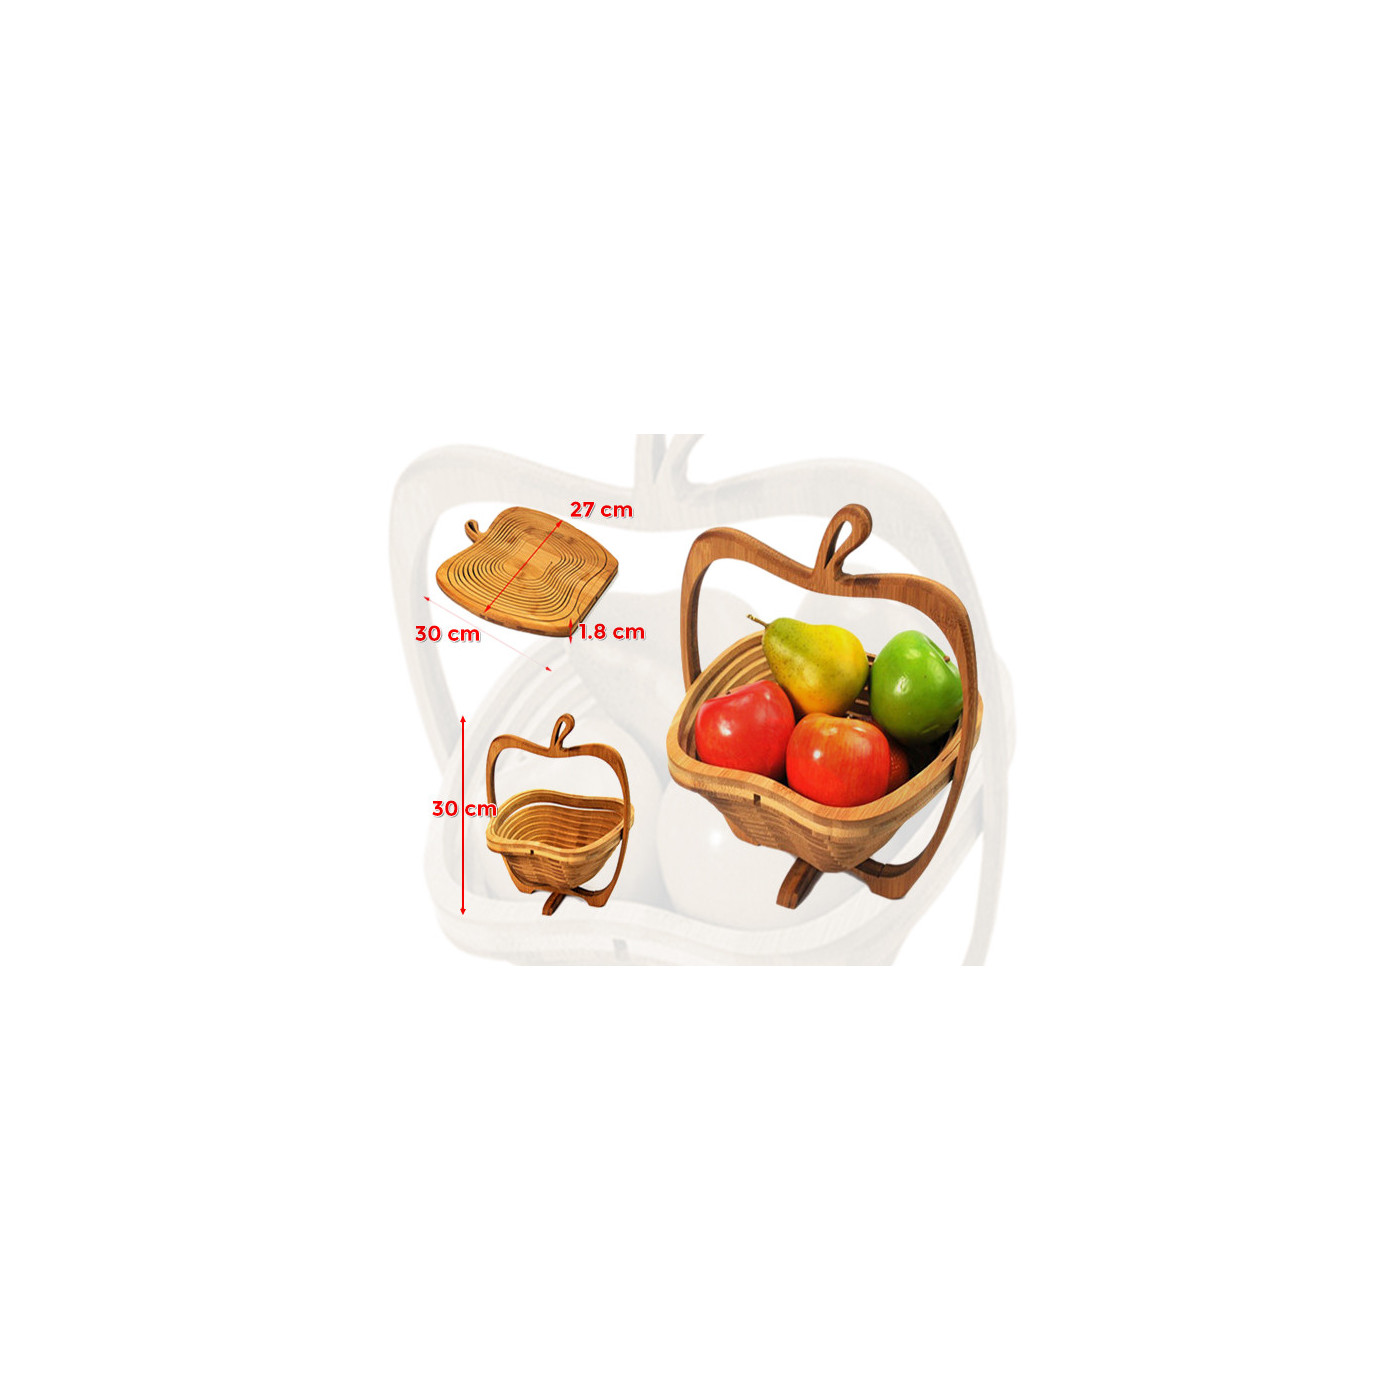 Deco wooden fruit basket (foldable)  - 1